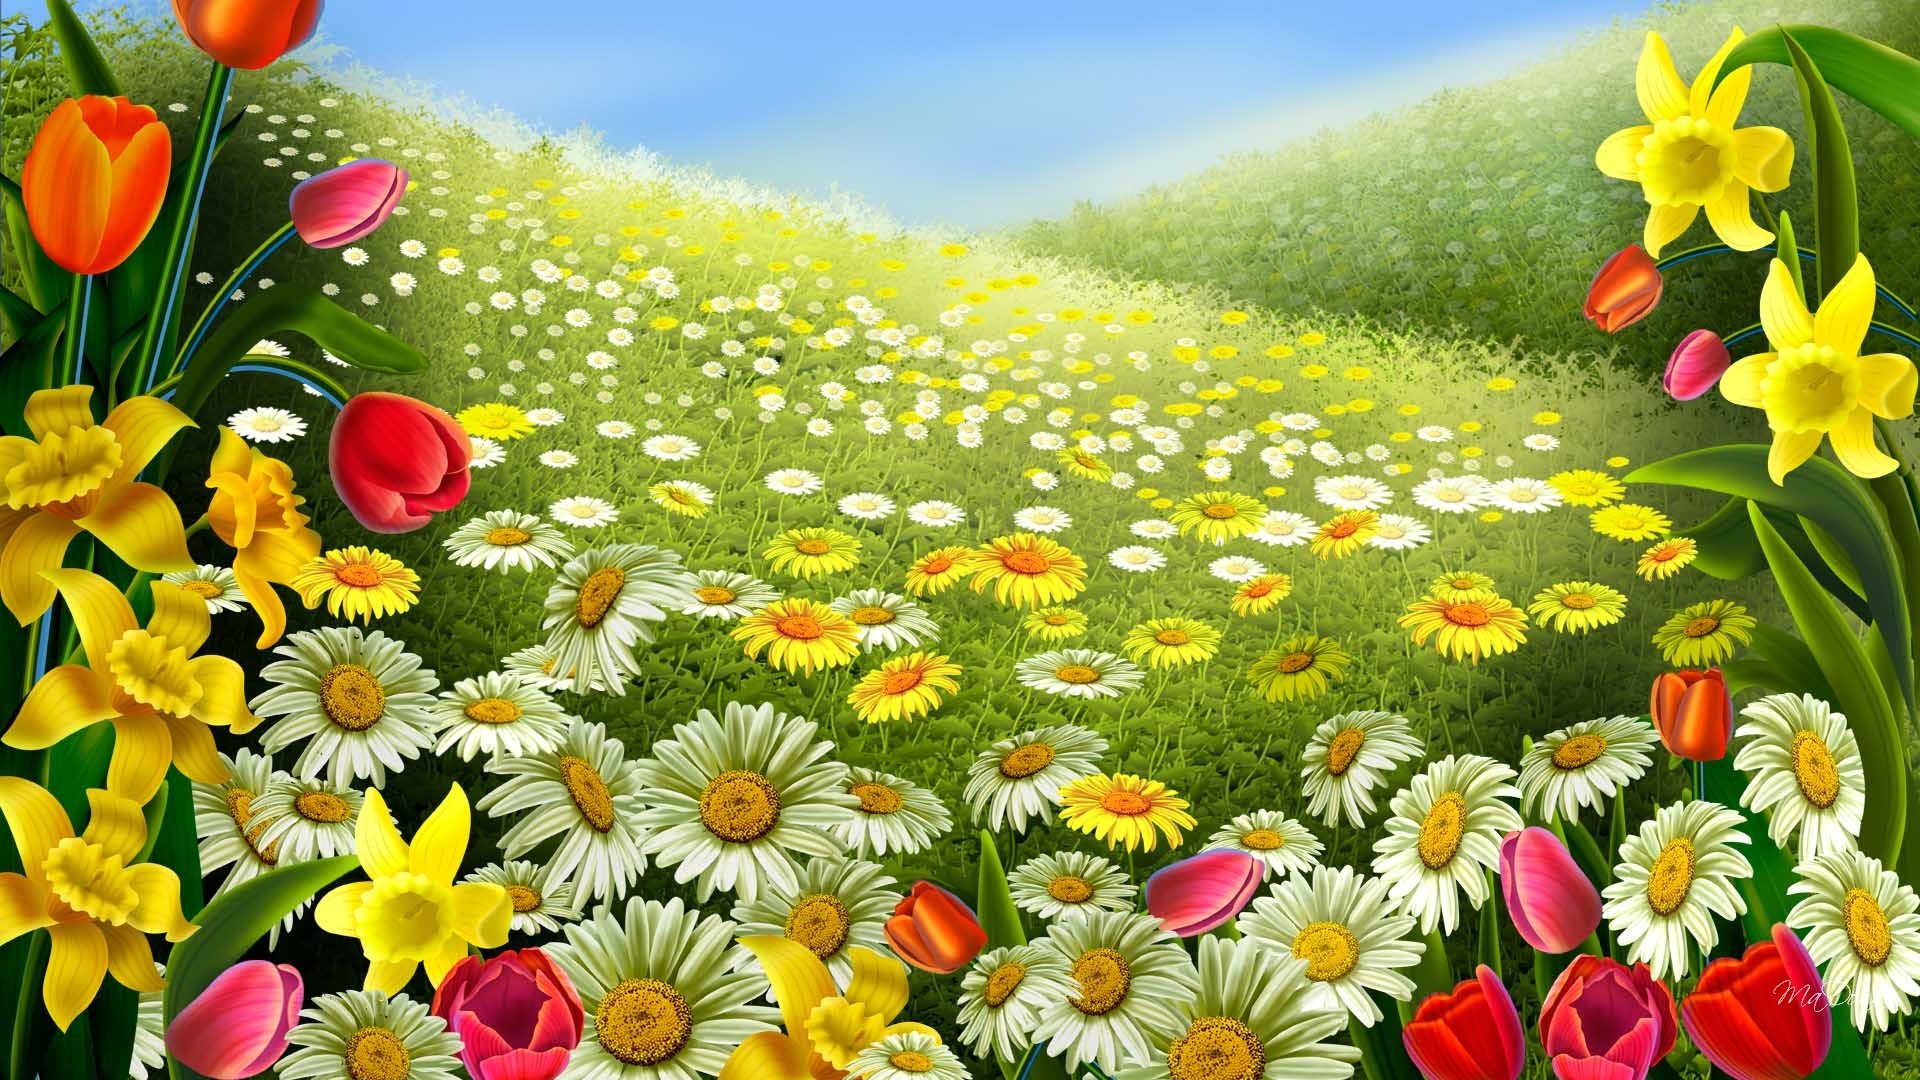 Desktop Wallpaper Spring   Desktop Backgrounds 1920x1080